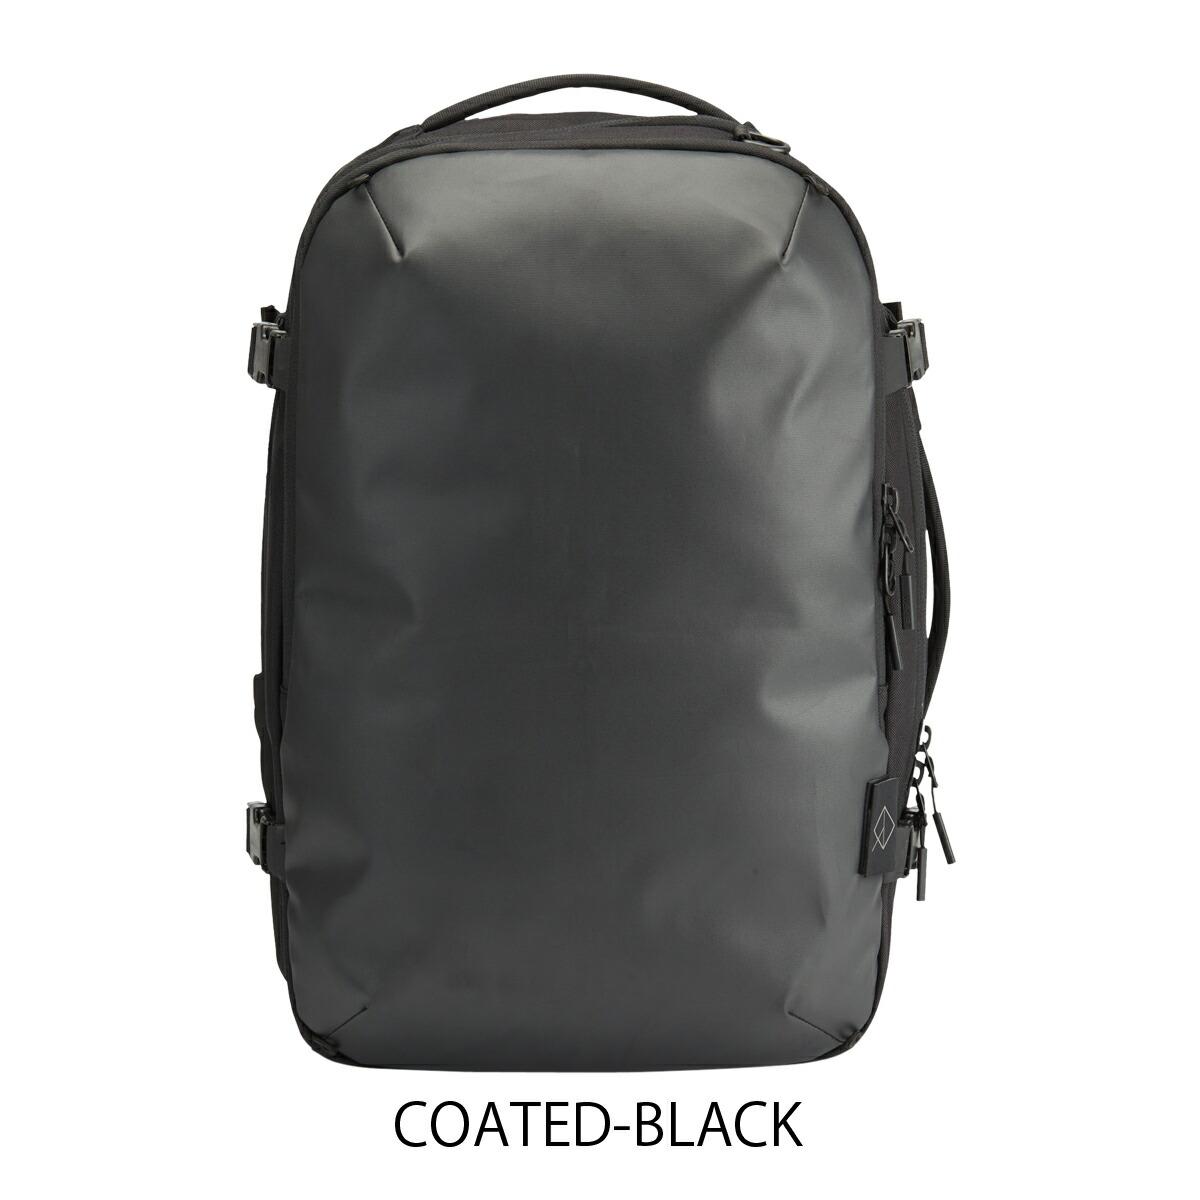 COATED-BLACK